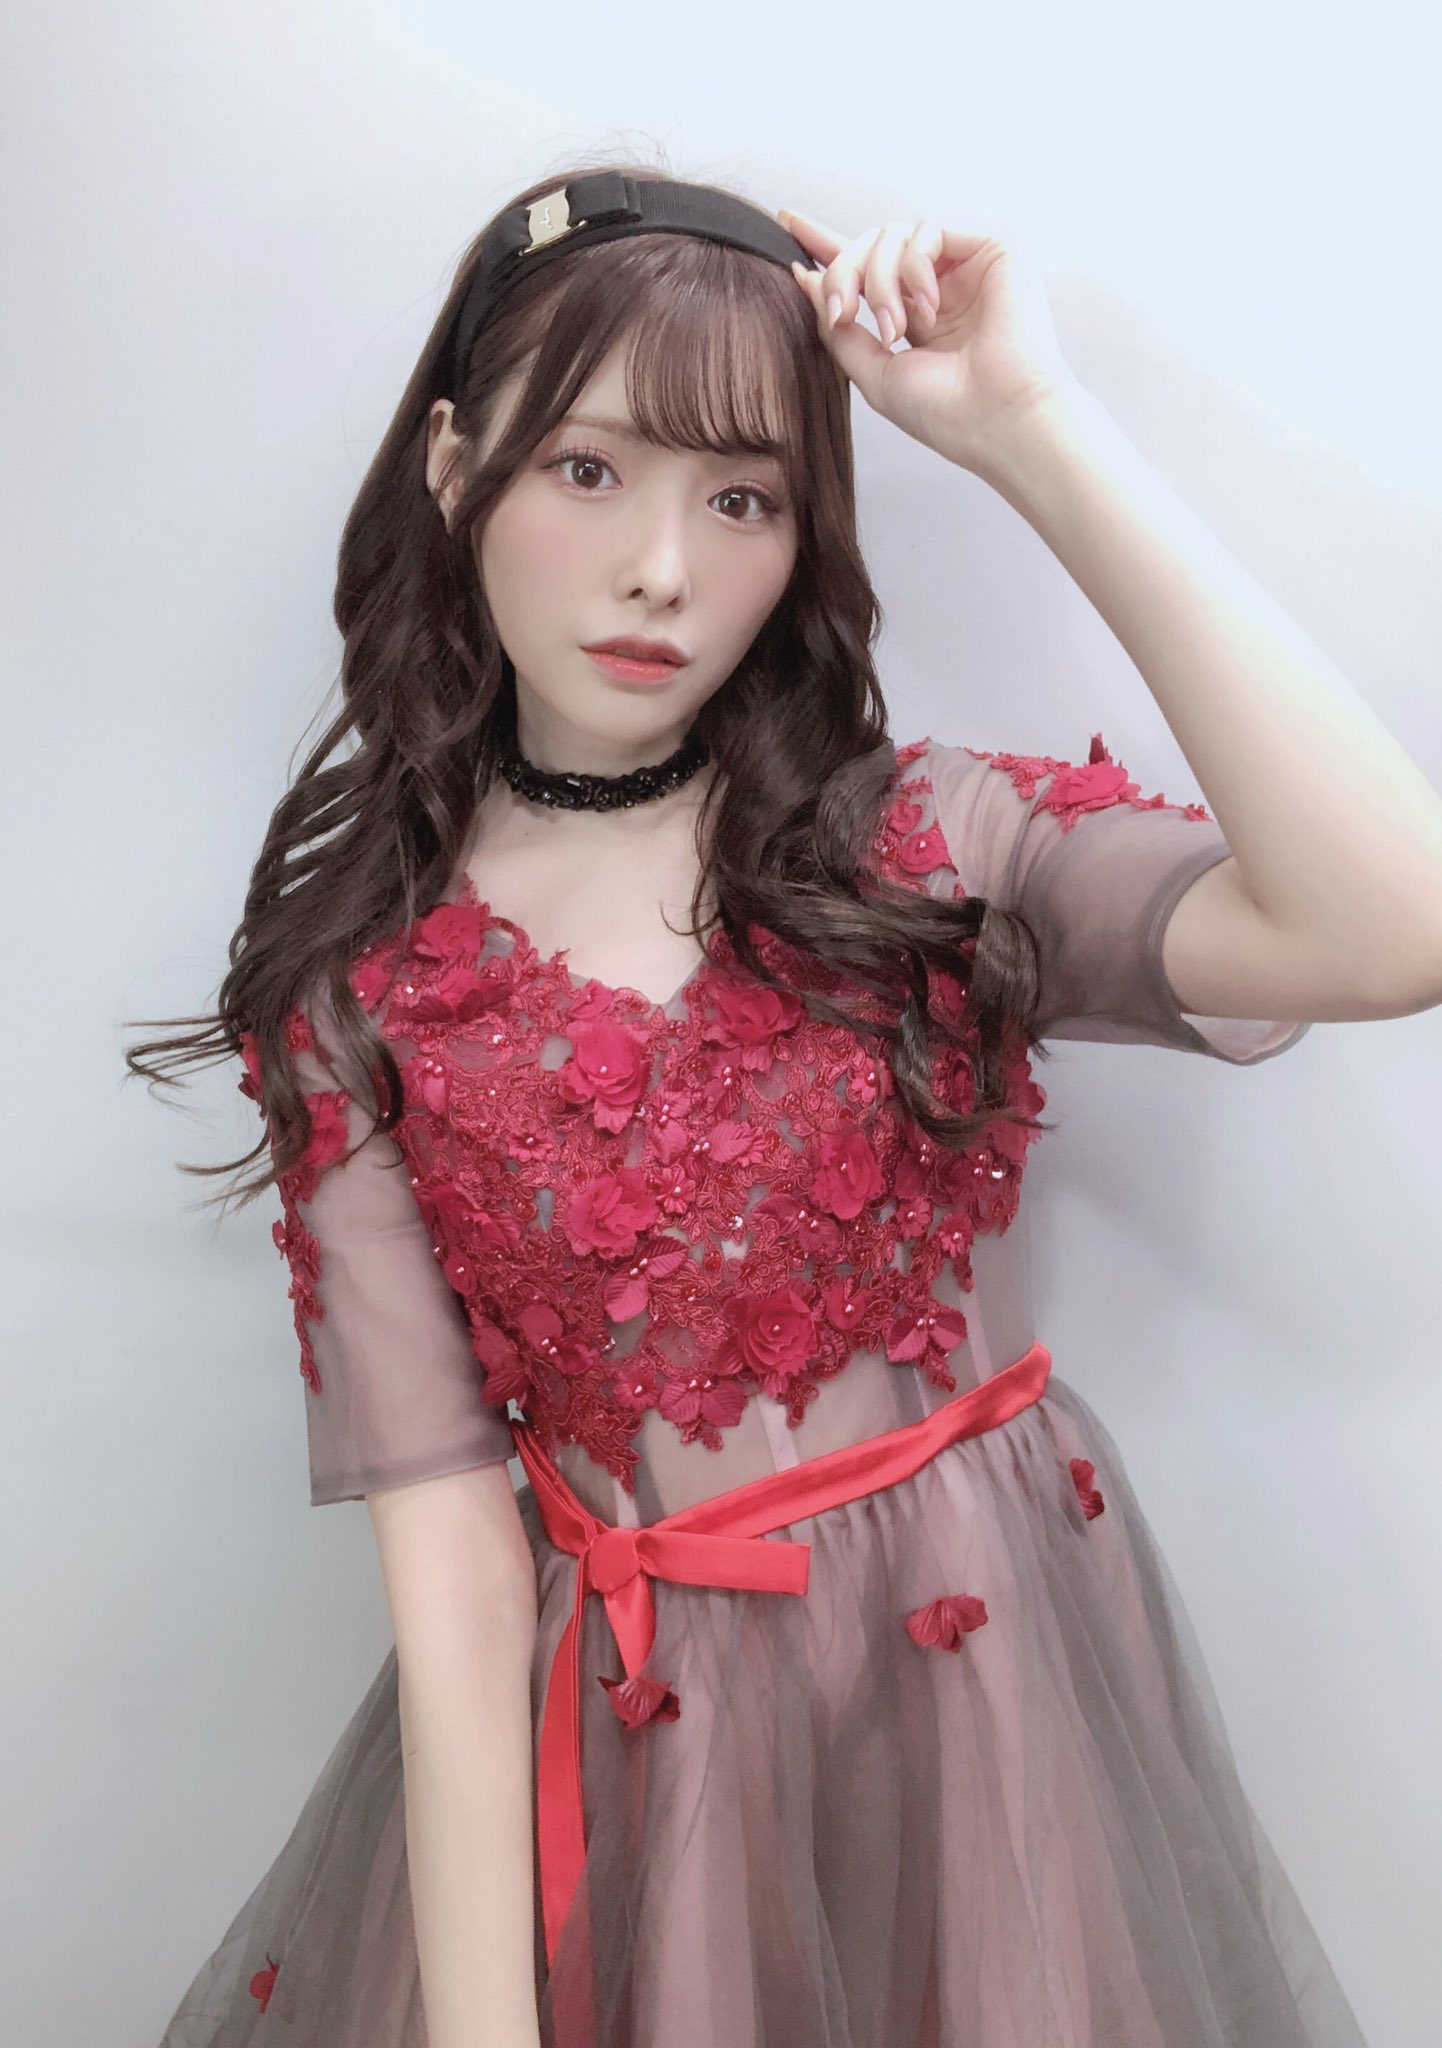 Arinahashimoto1 1205504656039743488_p1